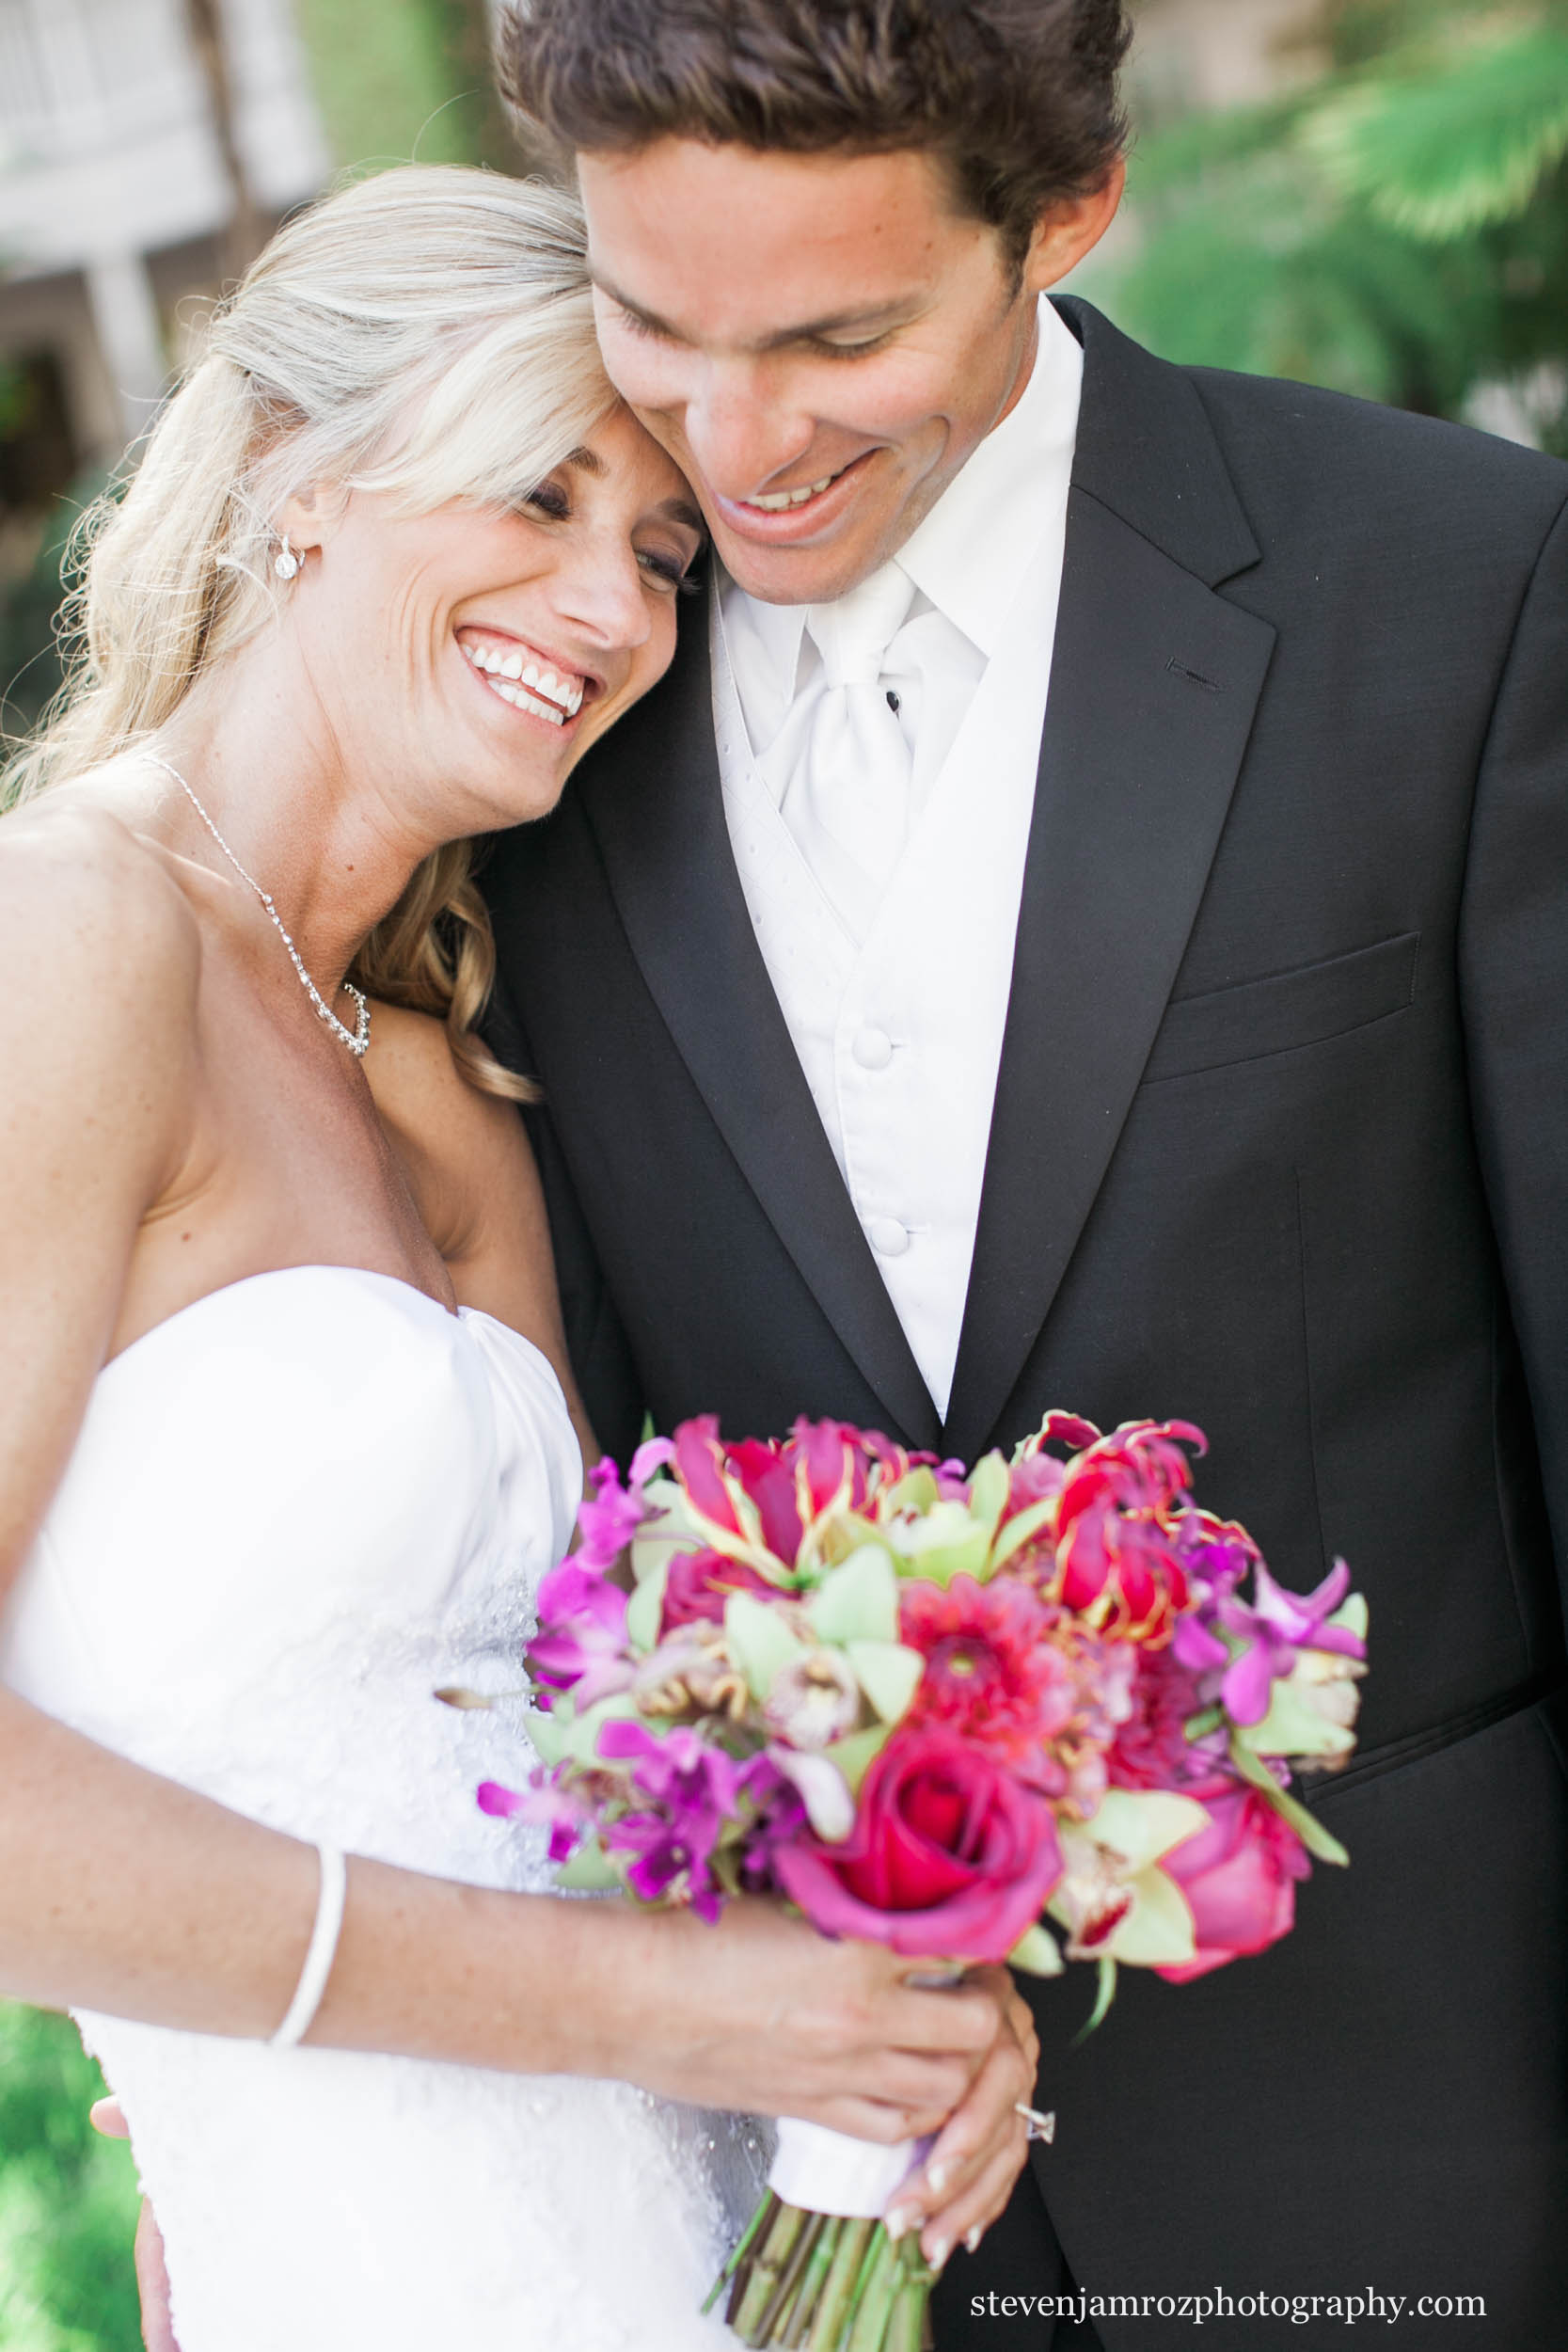 laughing-bride-and-groom-wedding-raleigh-steven-jamroz-photography-0096.jpg